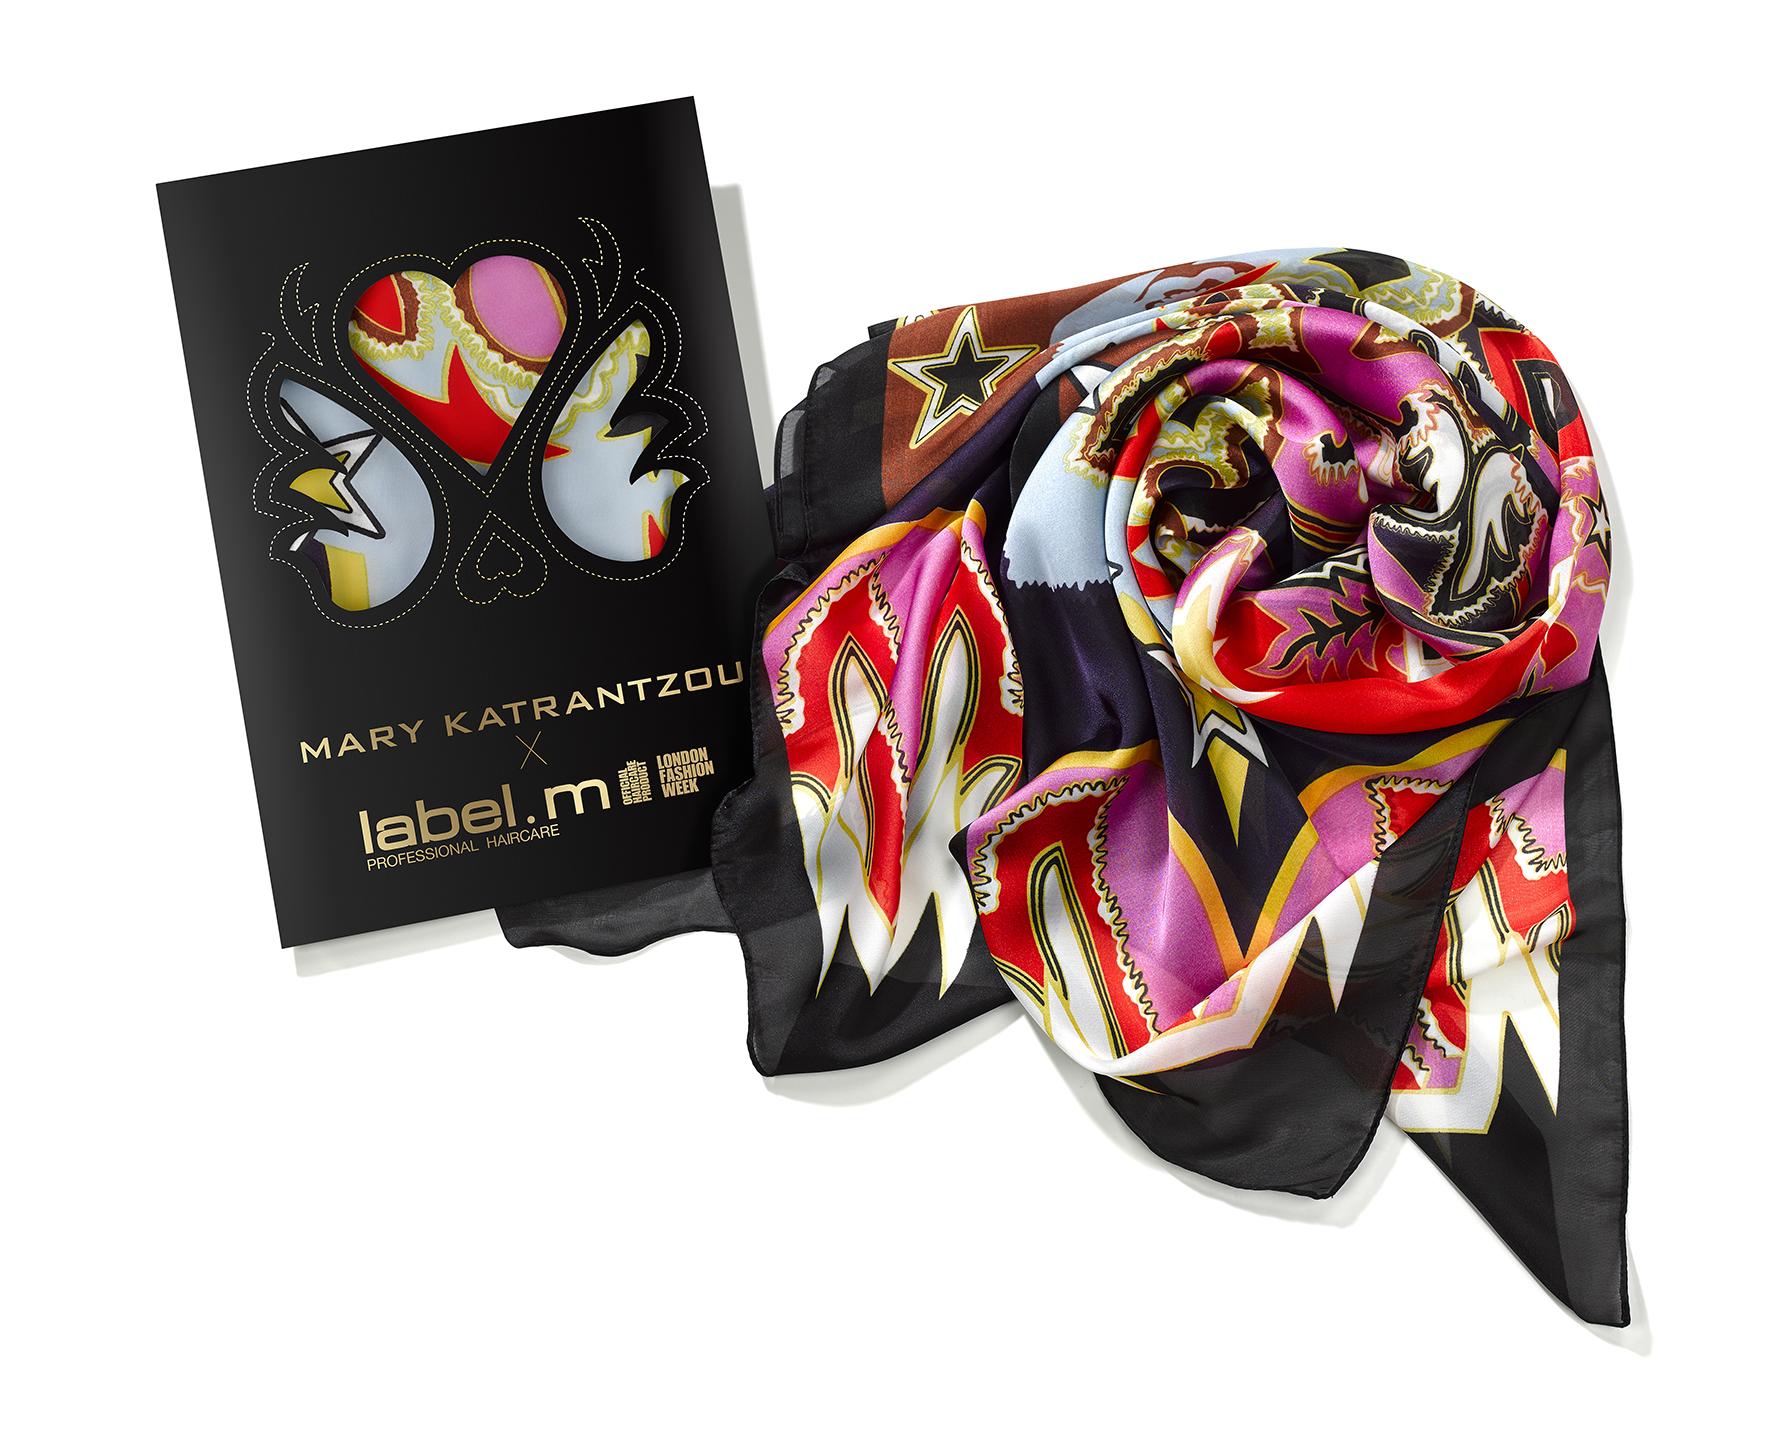 The Mary Katrantzou x Label.m scarf